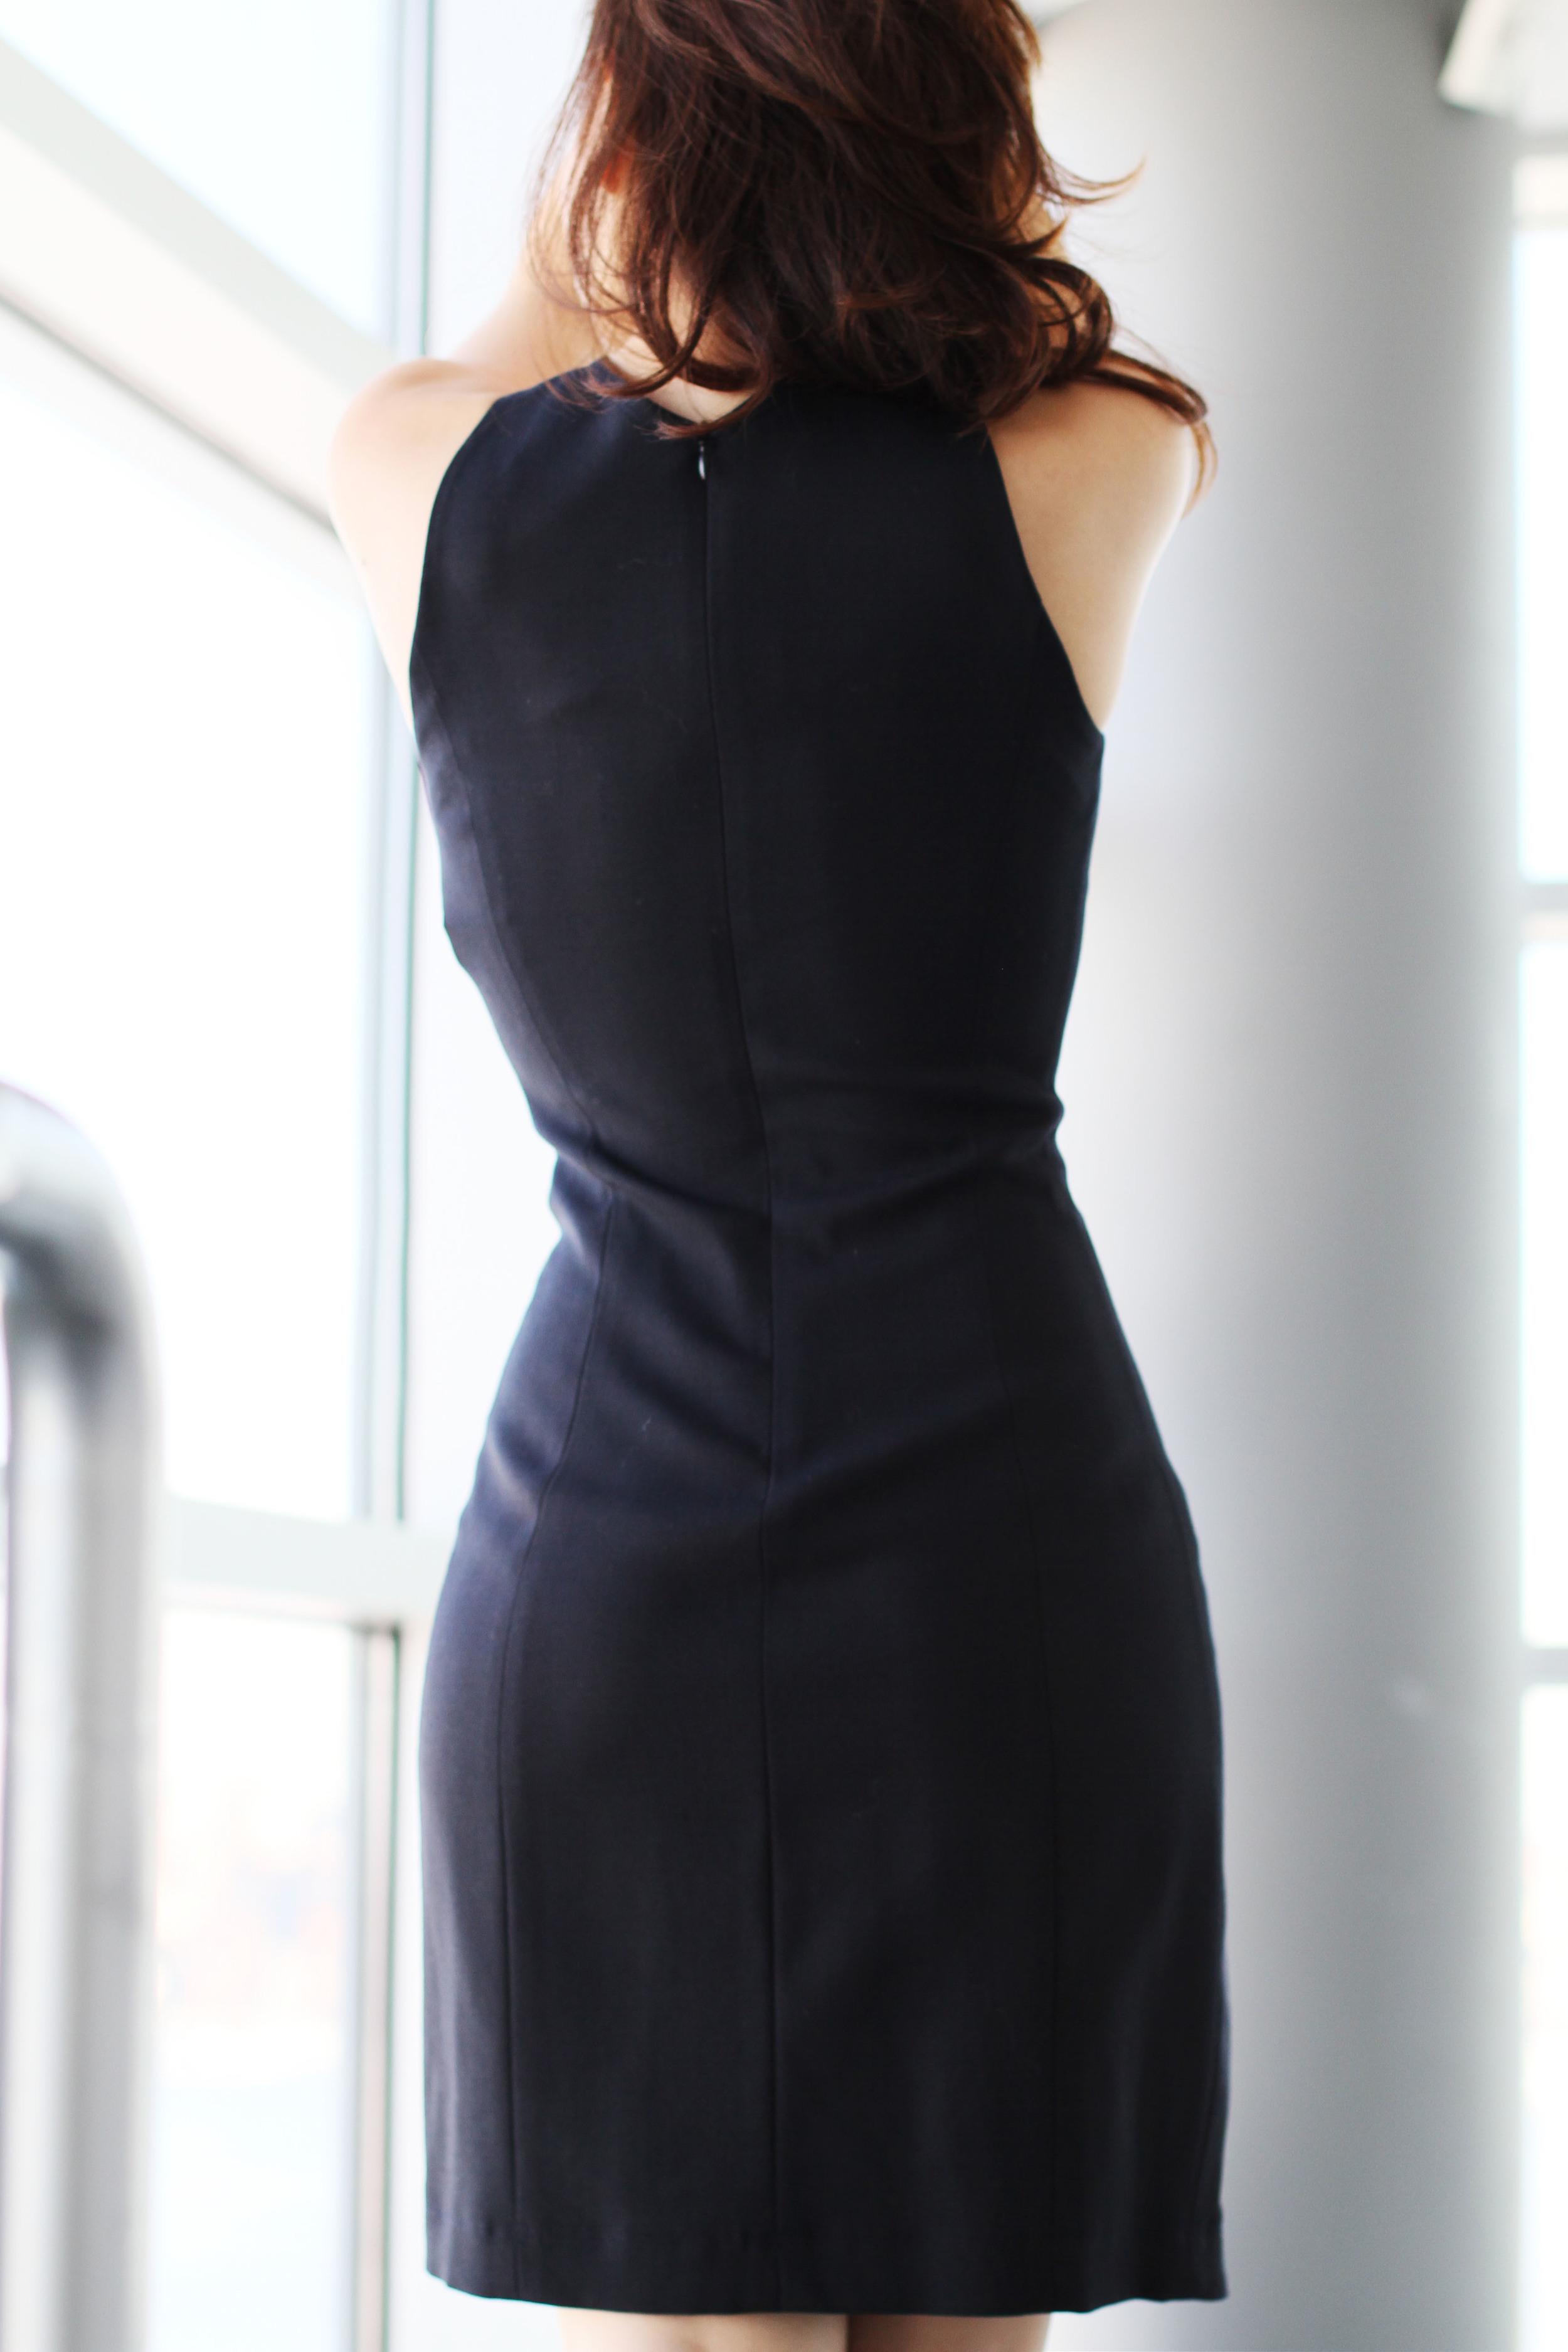 onepointsix office dress back.jpg